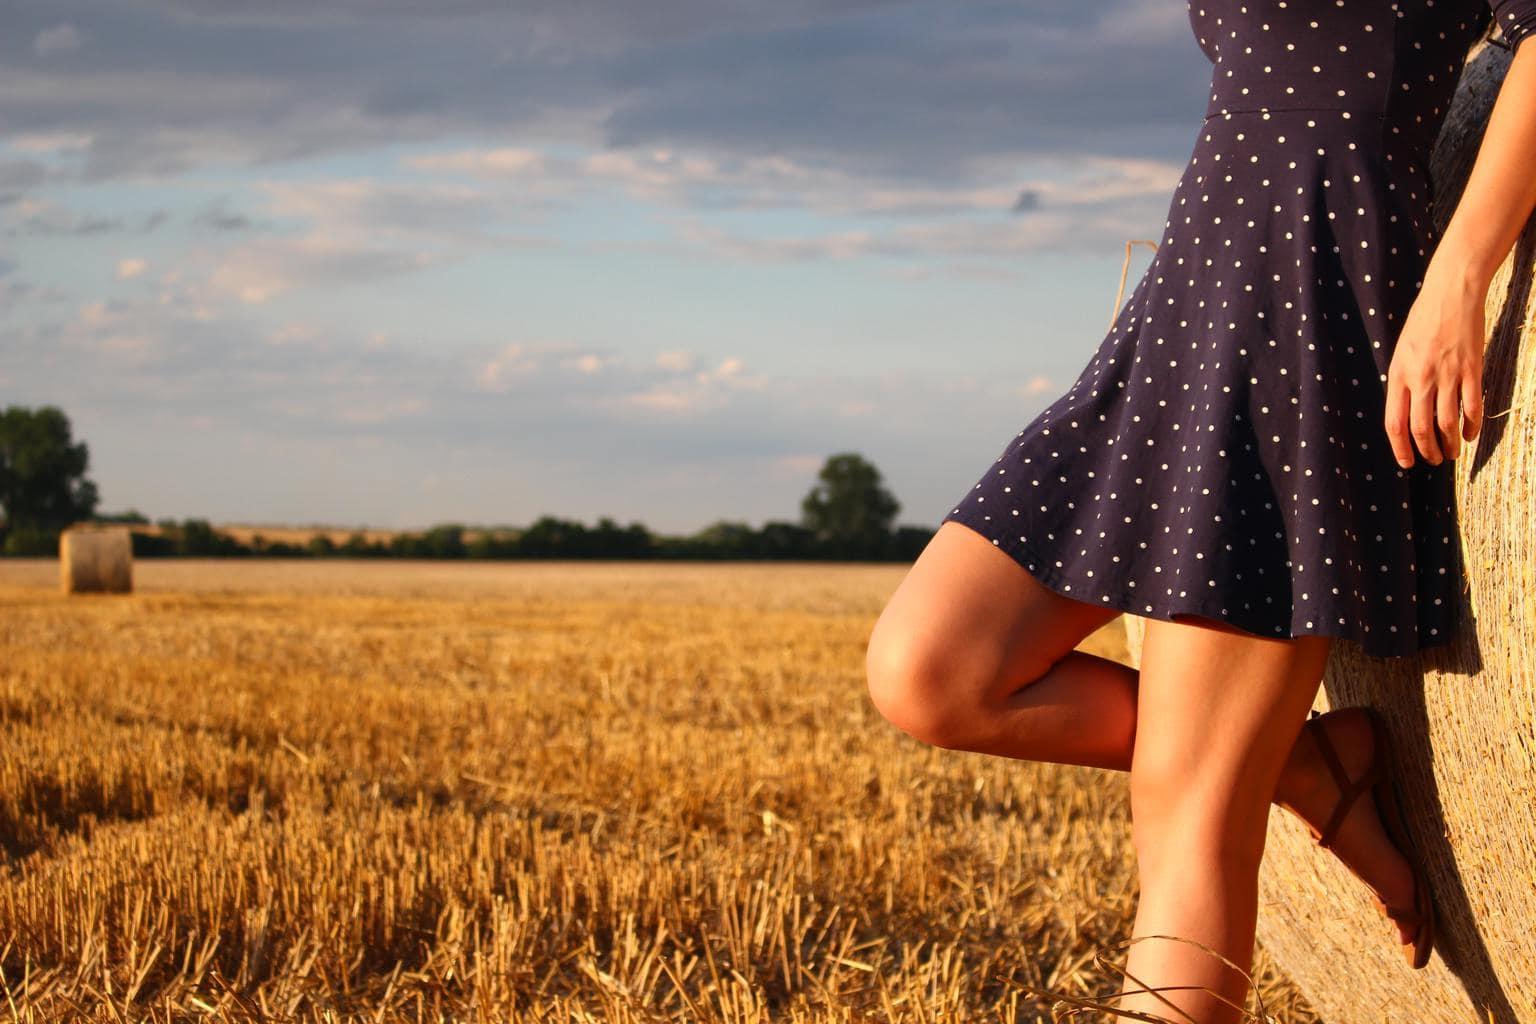 Girl wearing a polka dot dress